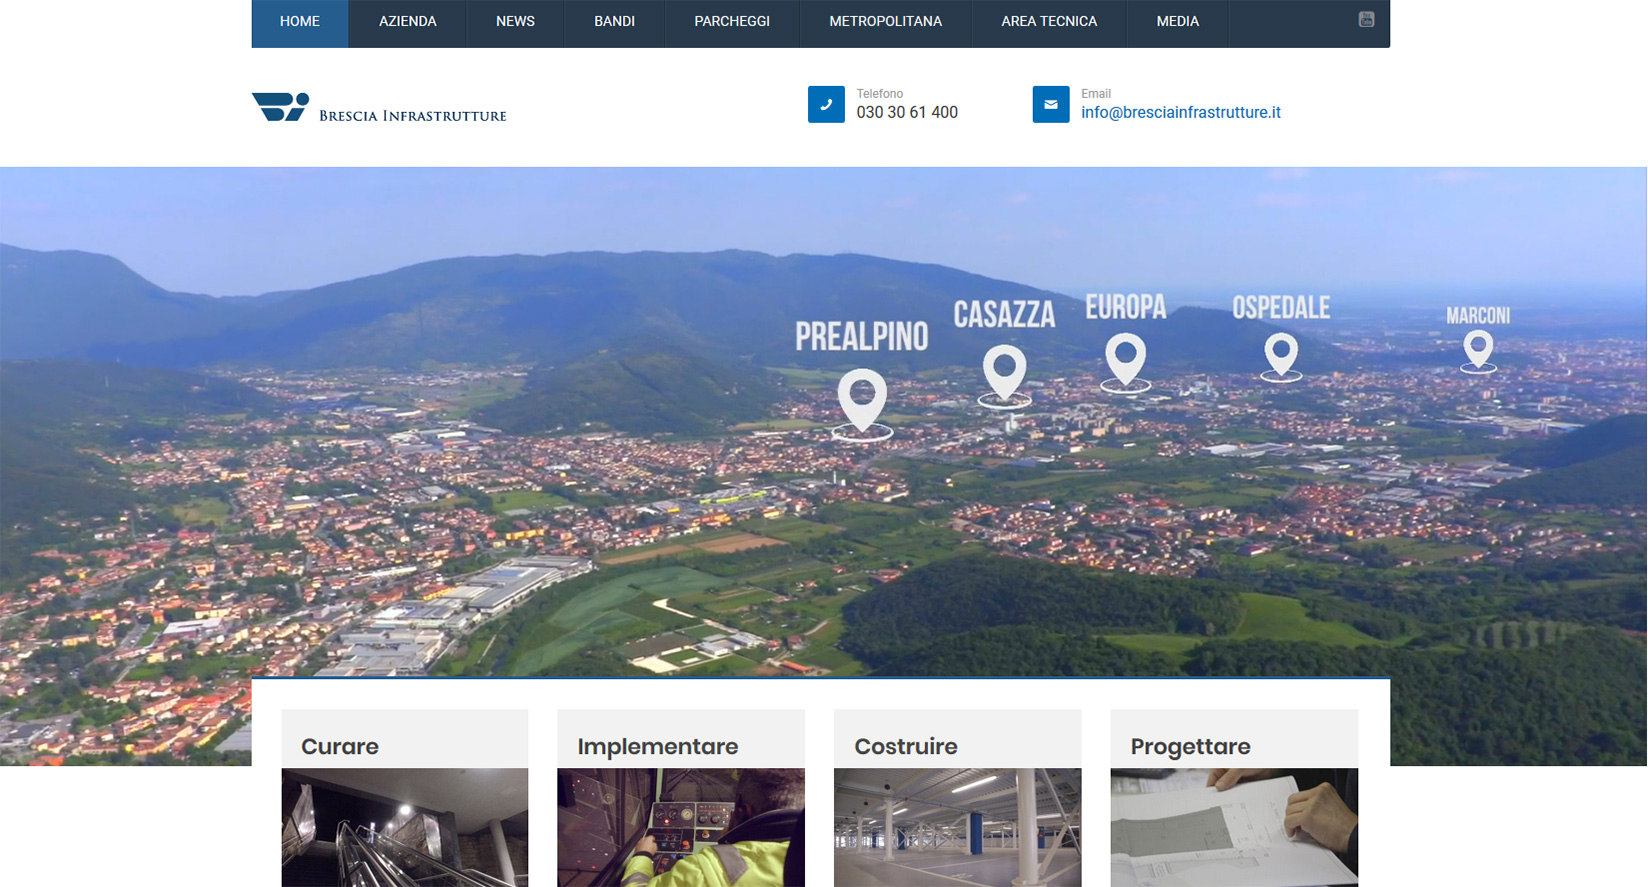 Brescia Infrastrutture